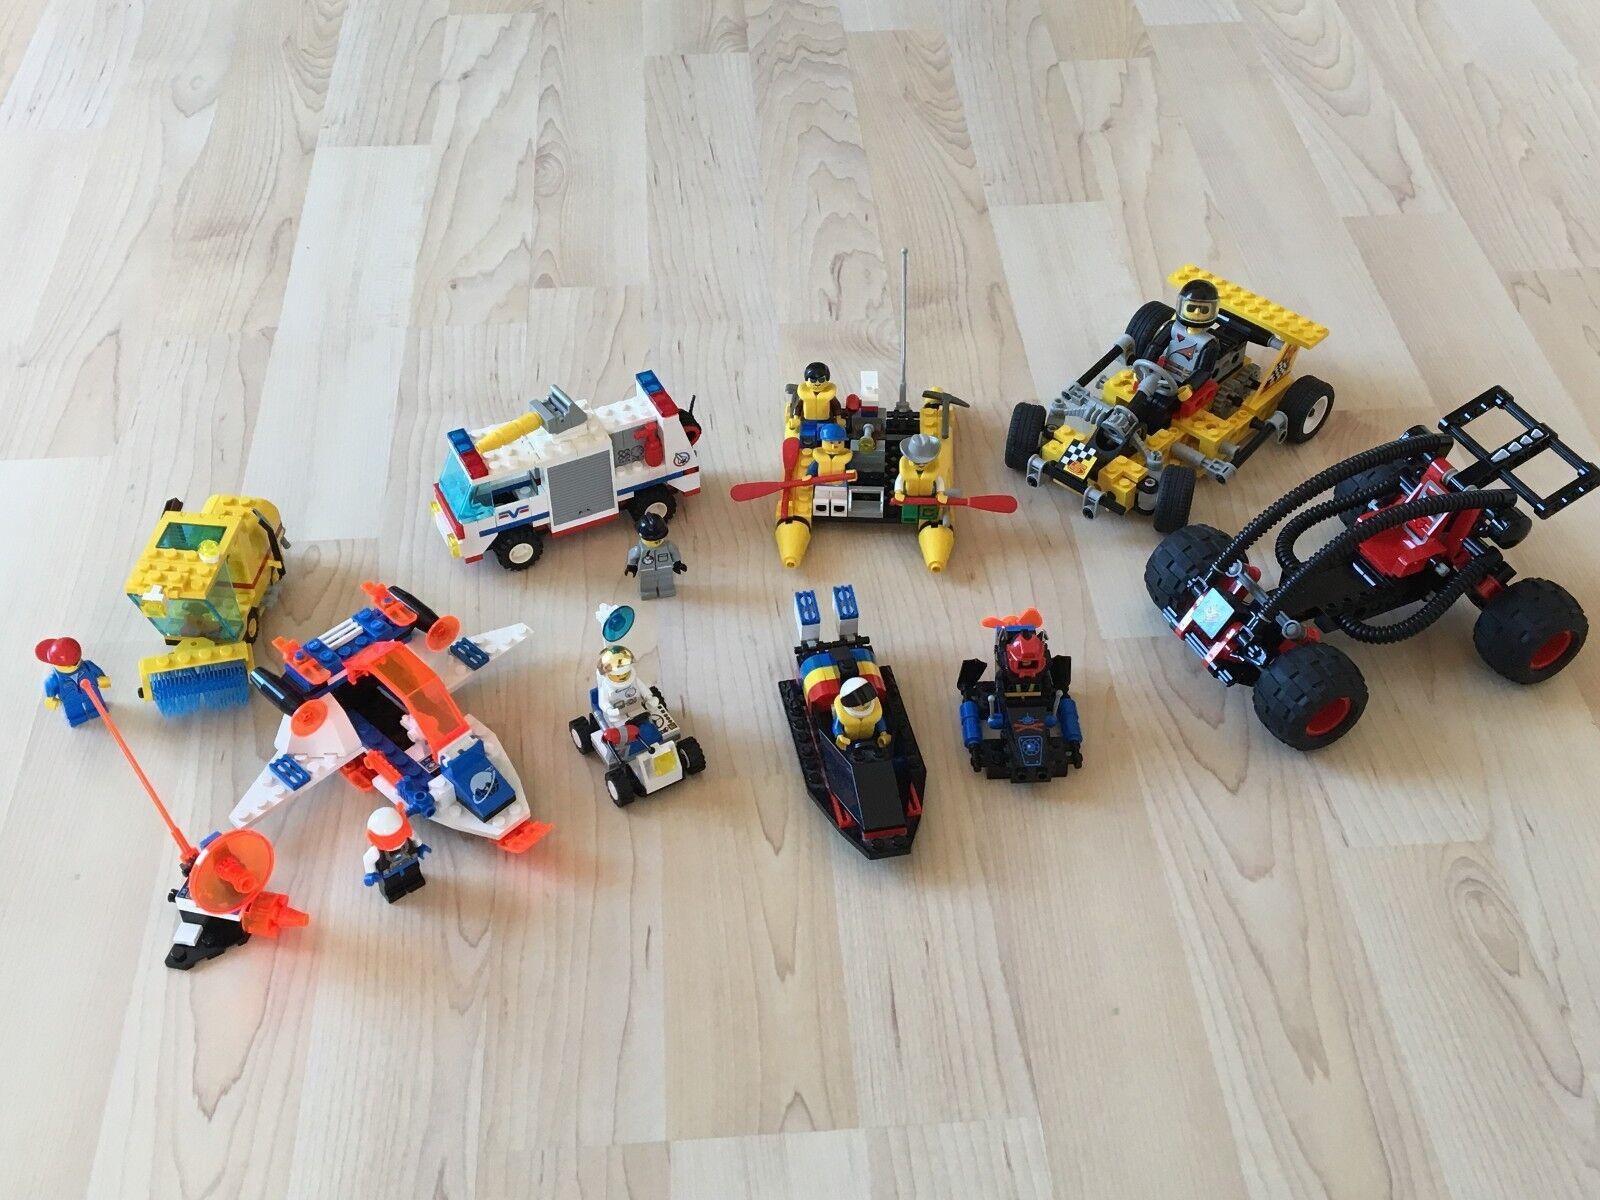 Lego System 6649 6516 6614 6879 6115 6537 6665   Lego Technic 8225 8226